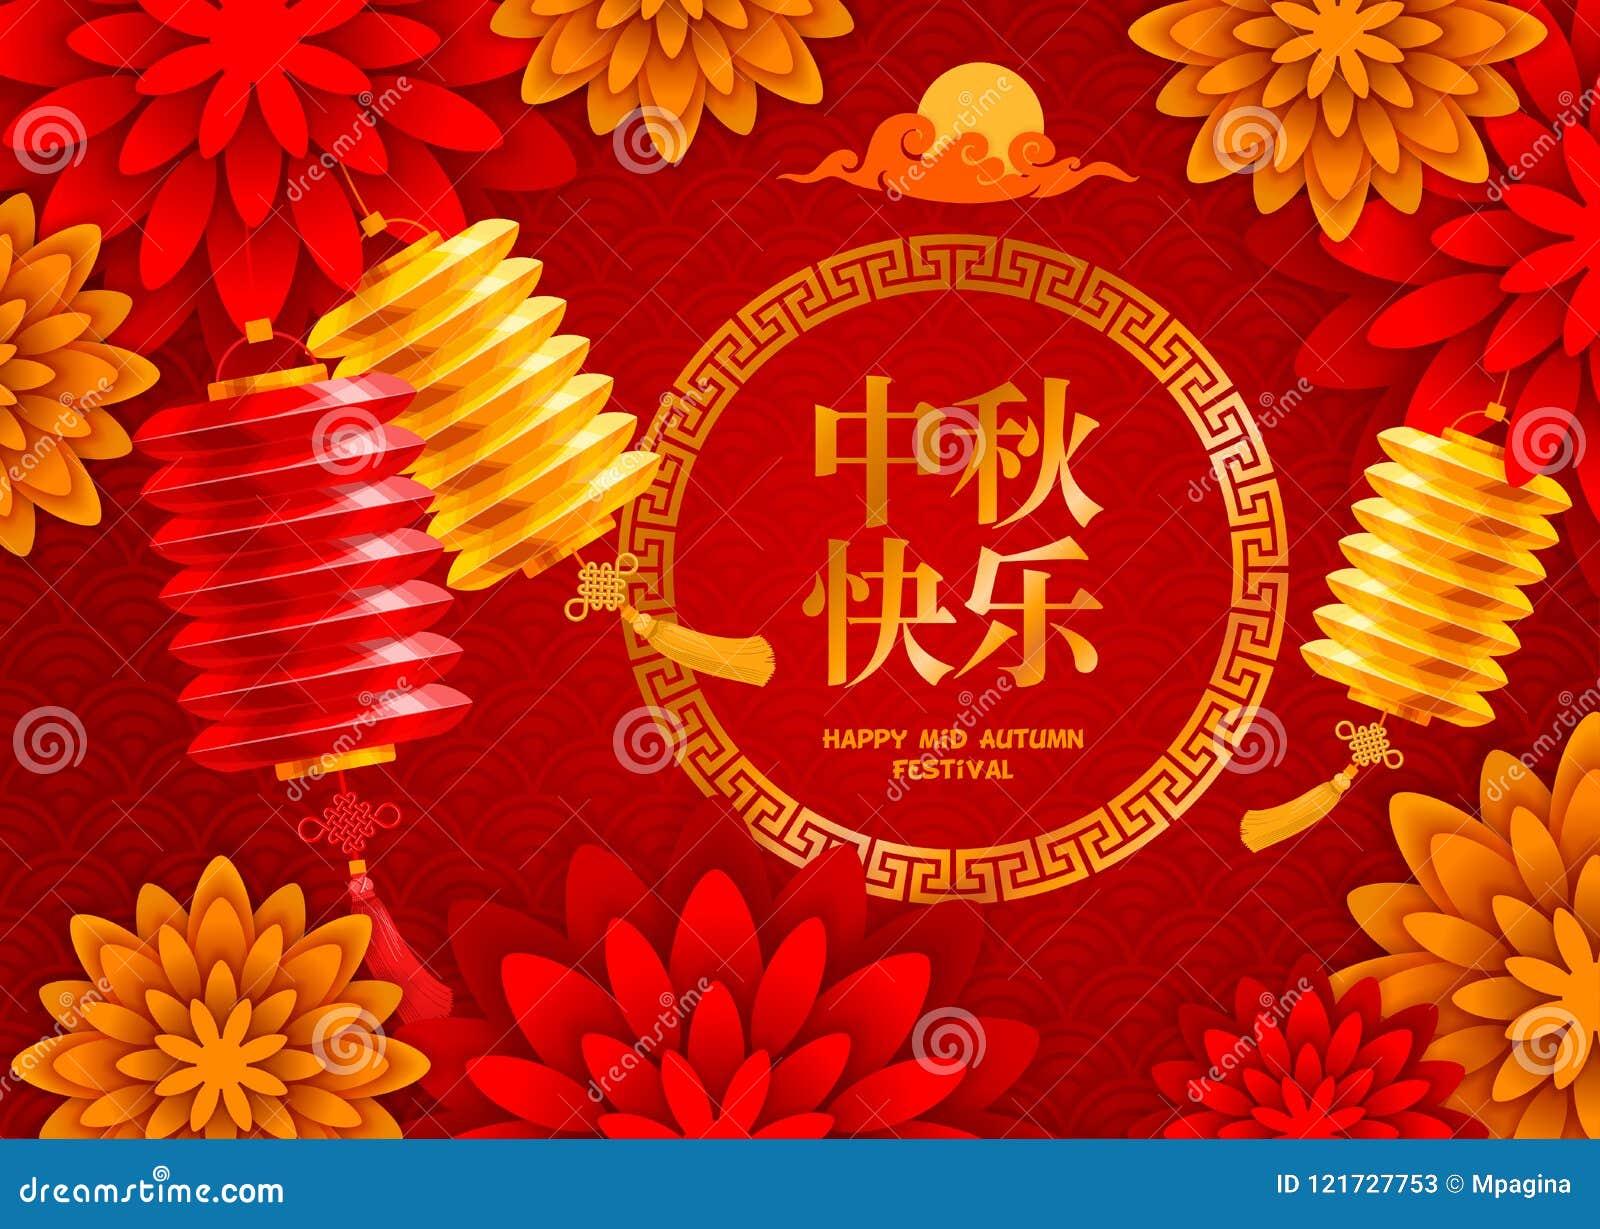 Mid autumn festival greeting card stock vector illustration of mid autumn festival greeting card m4hsunfo